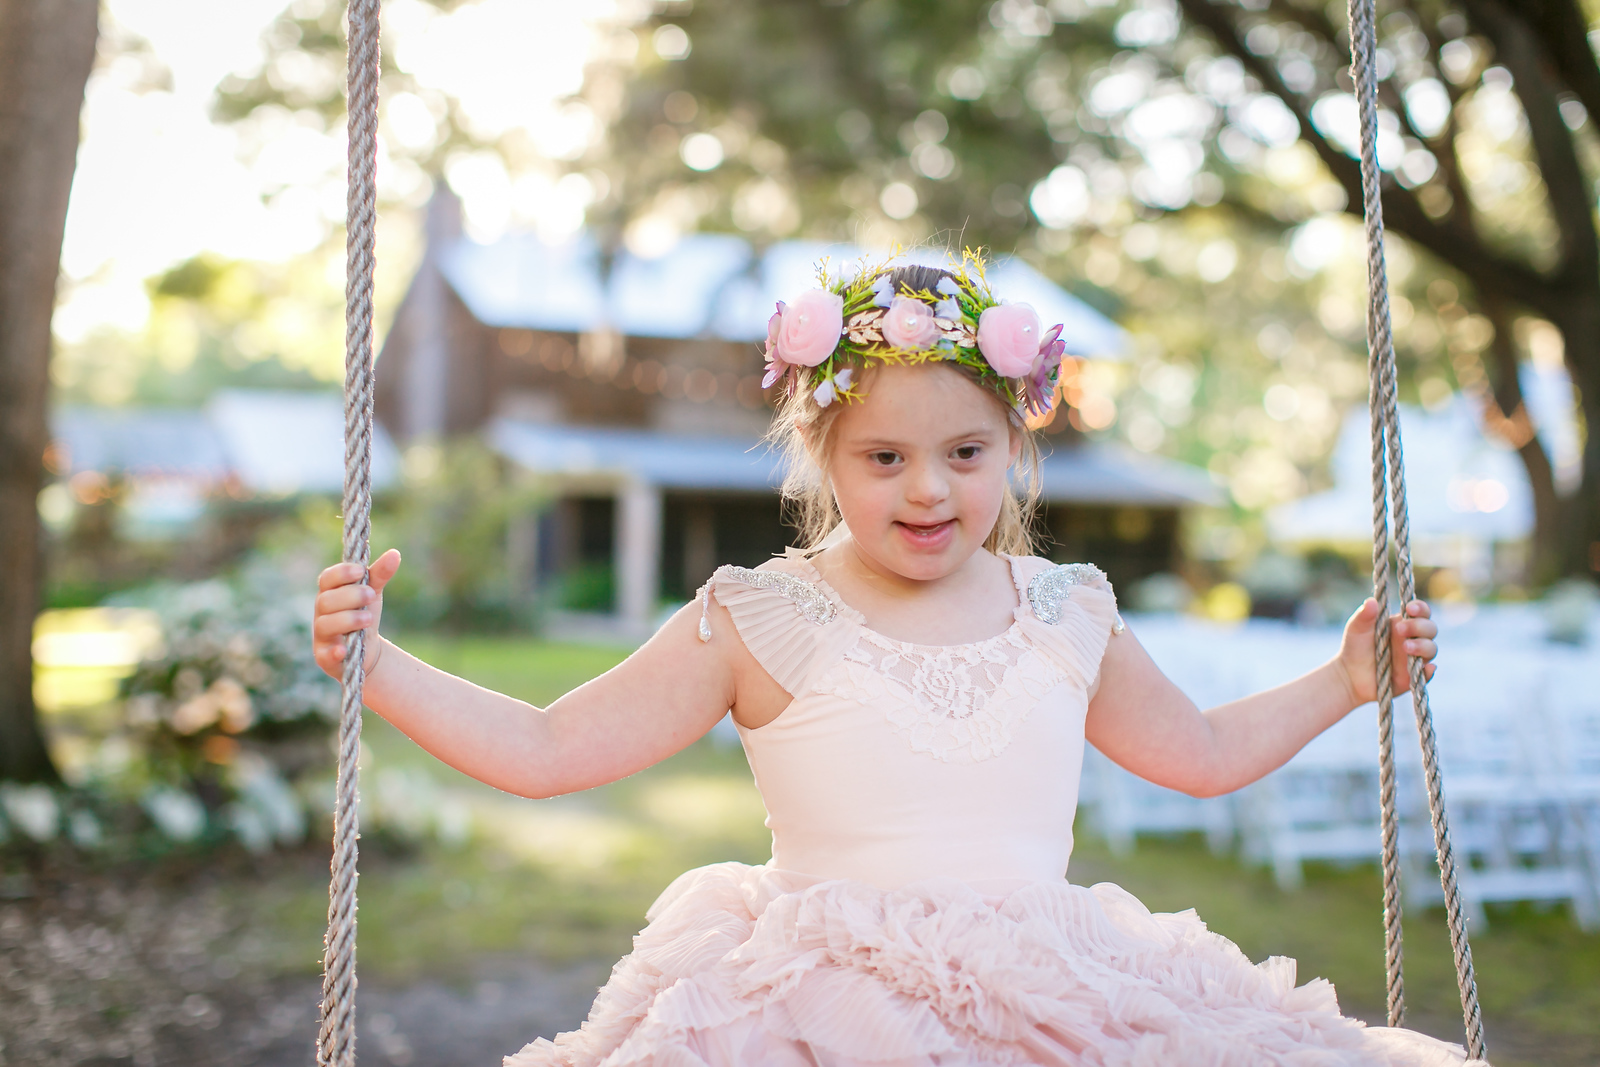 CAP2017-MadisonKyle-WEDDING-Giselle-TuckersFarmhouse-1038